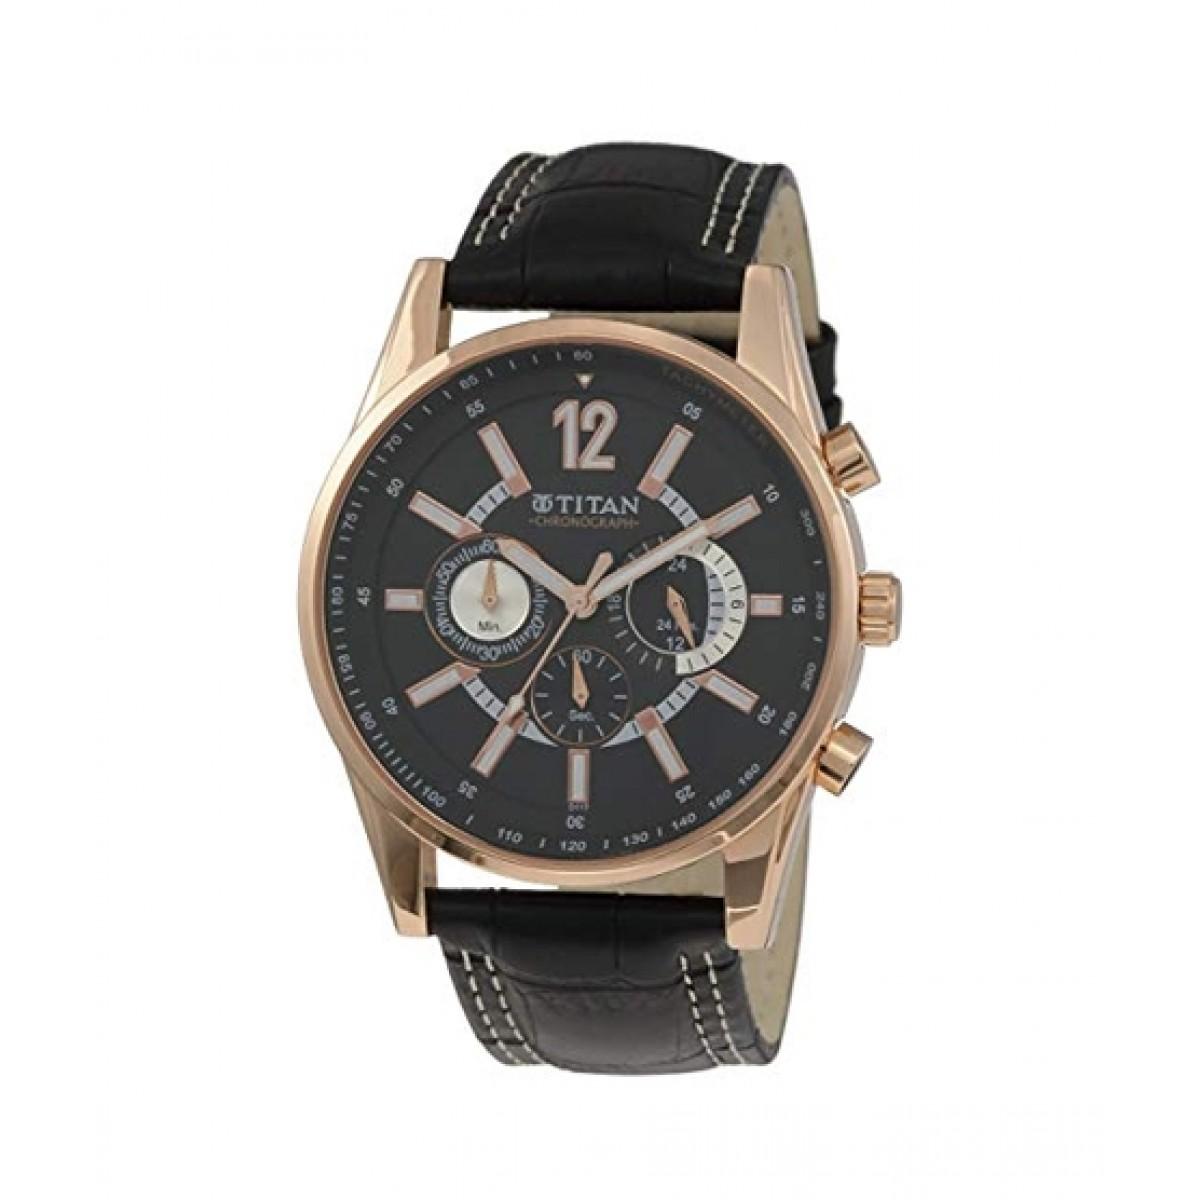 Titan Octane Men's Watch Black (9322WL02)